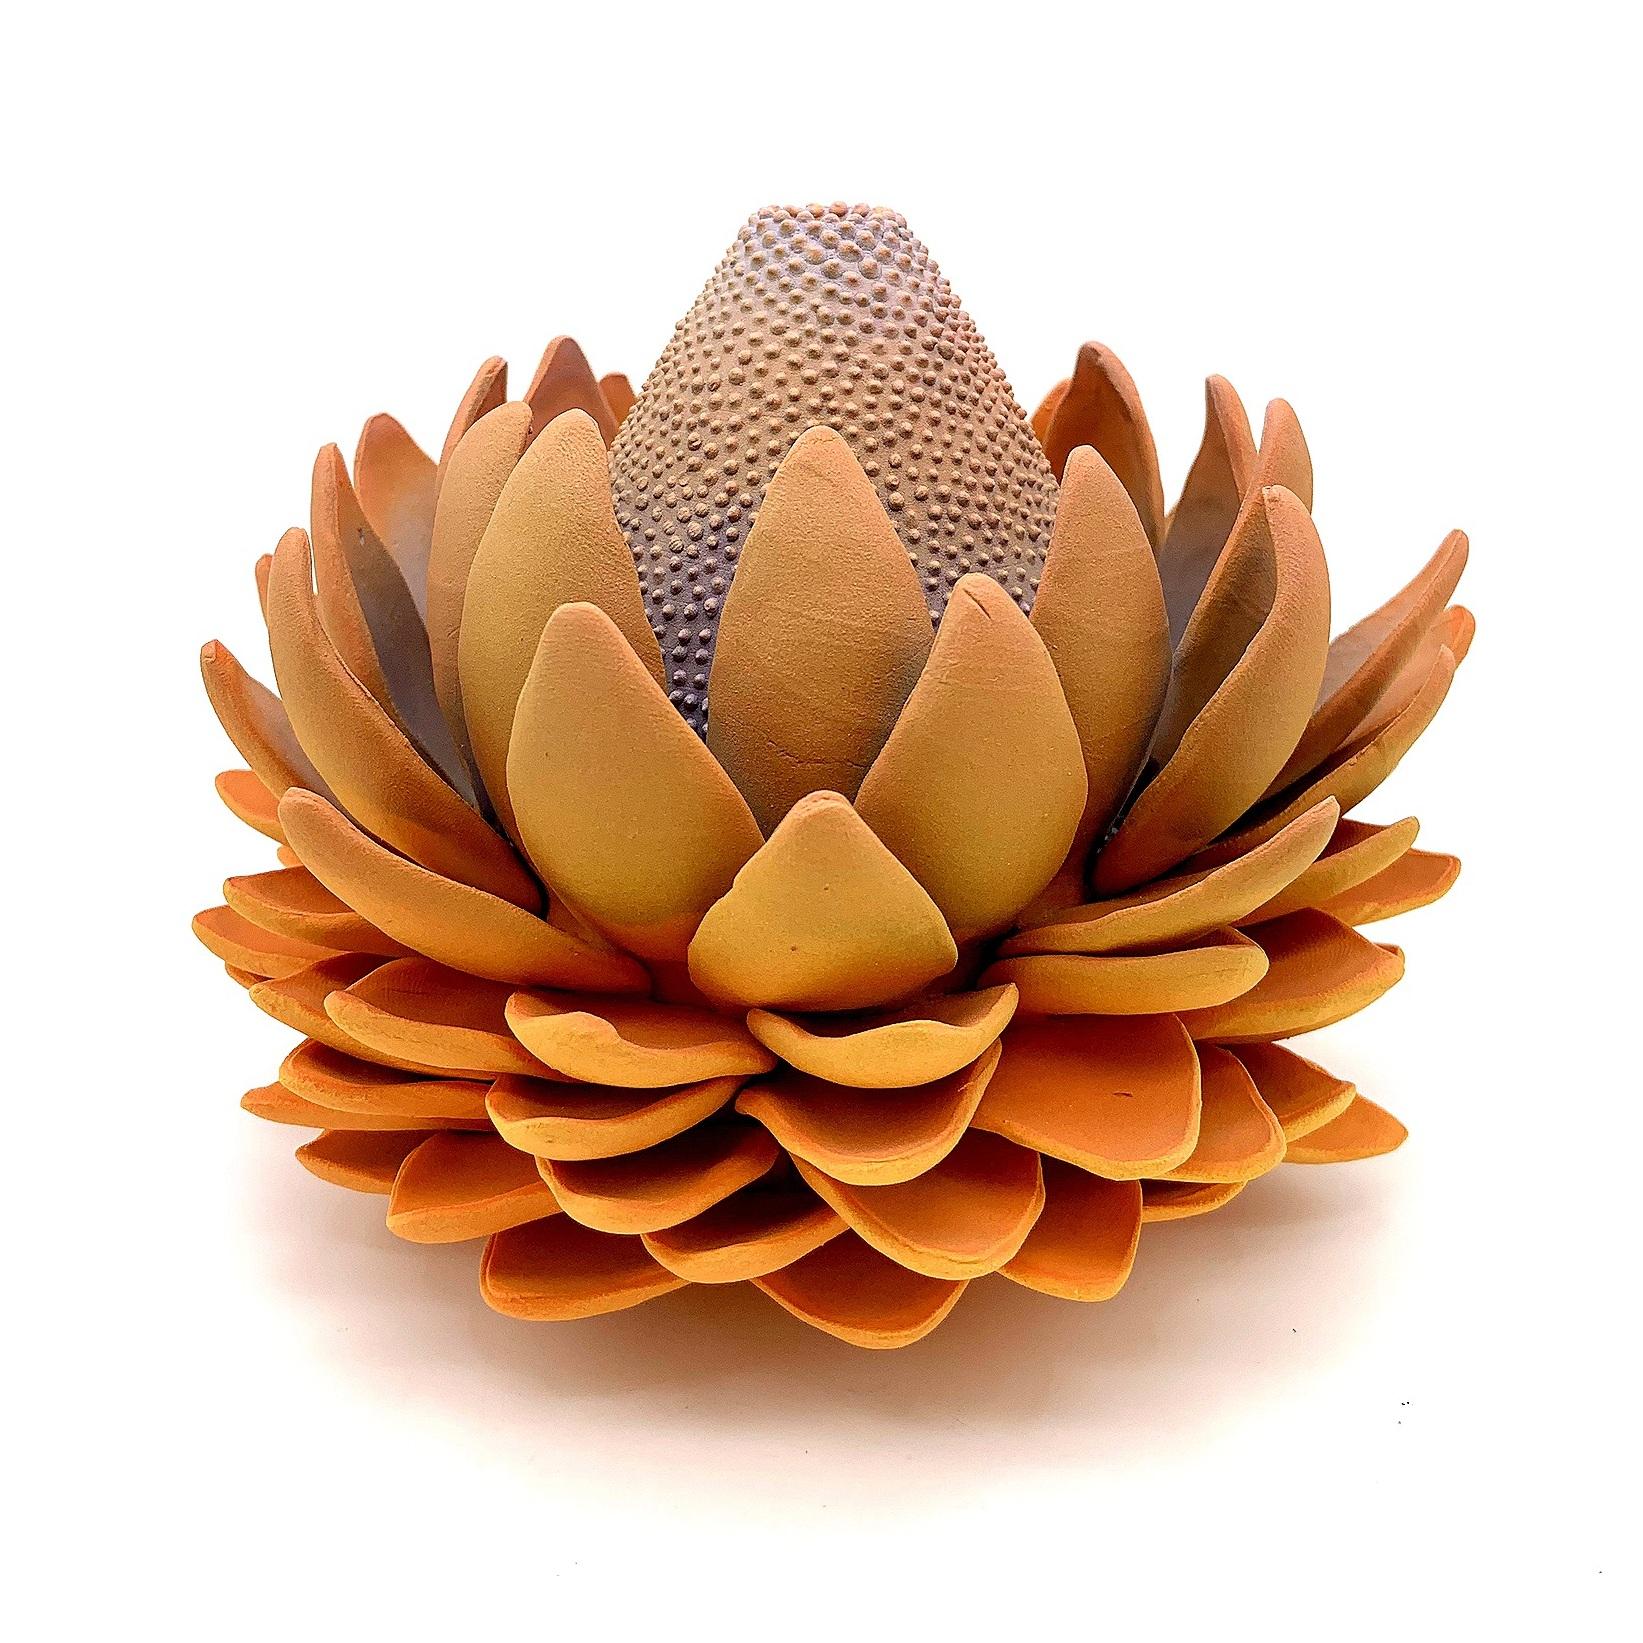 "Protea/ Cone Flower Hybrid - 6""x7""x7""Porcelain, Underglaze, ClearCone 5 Oxidation2019"